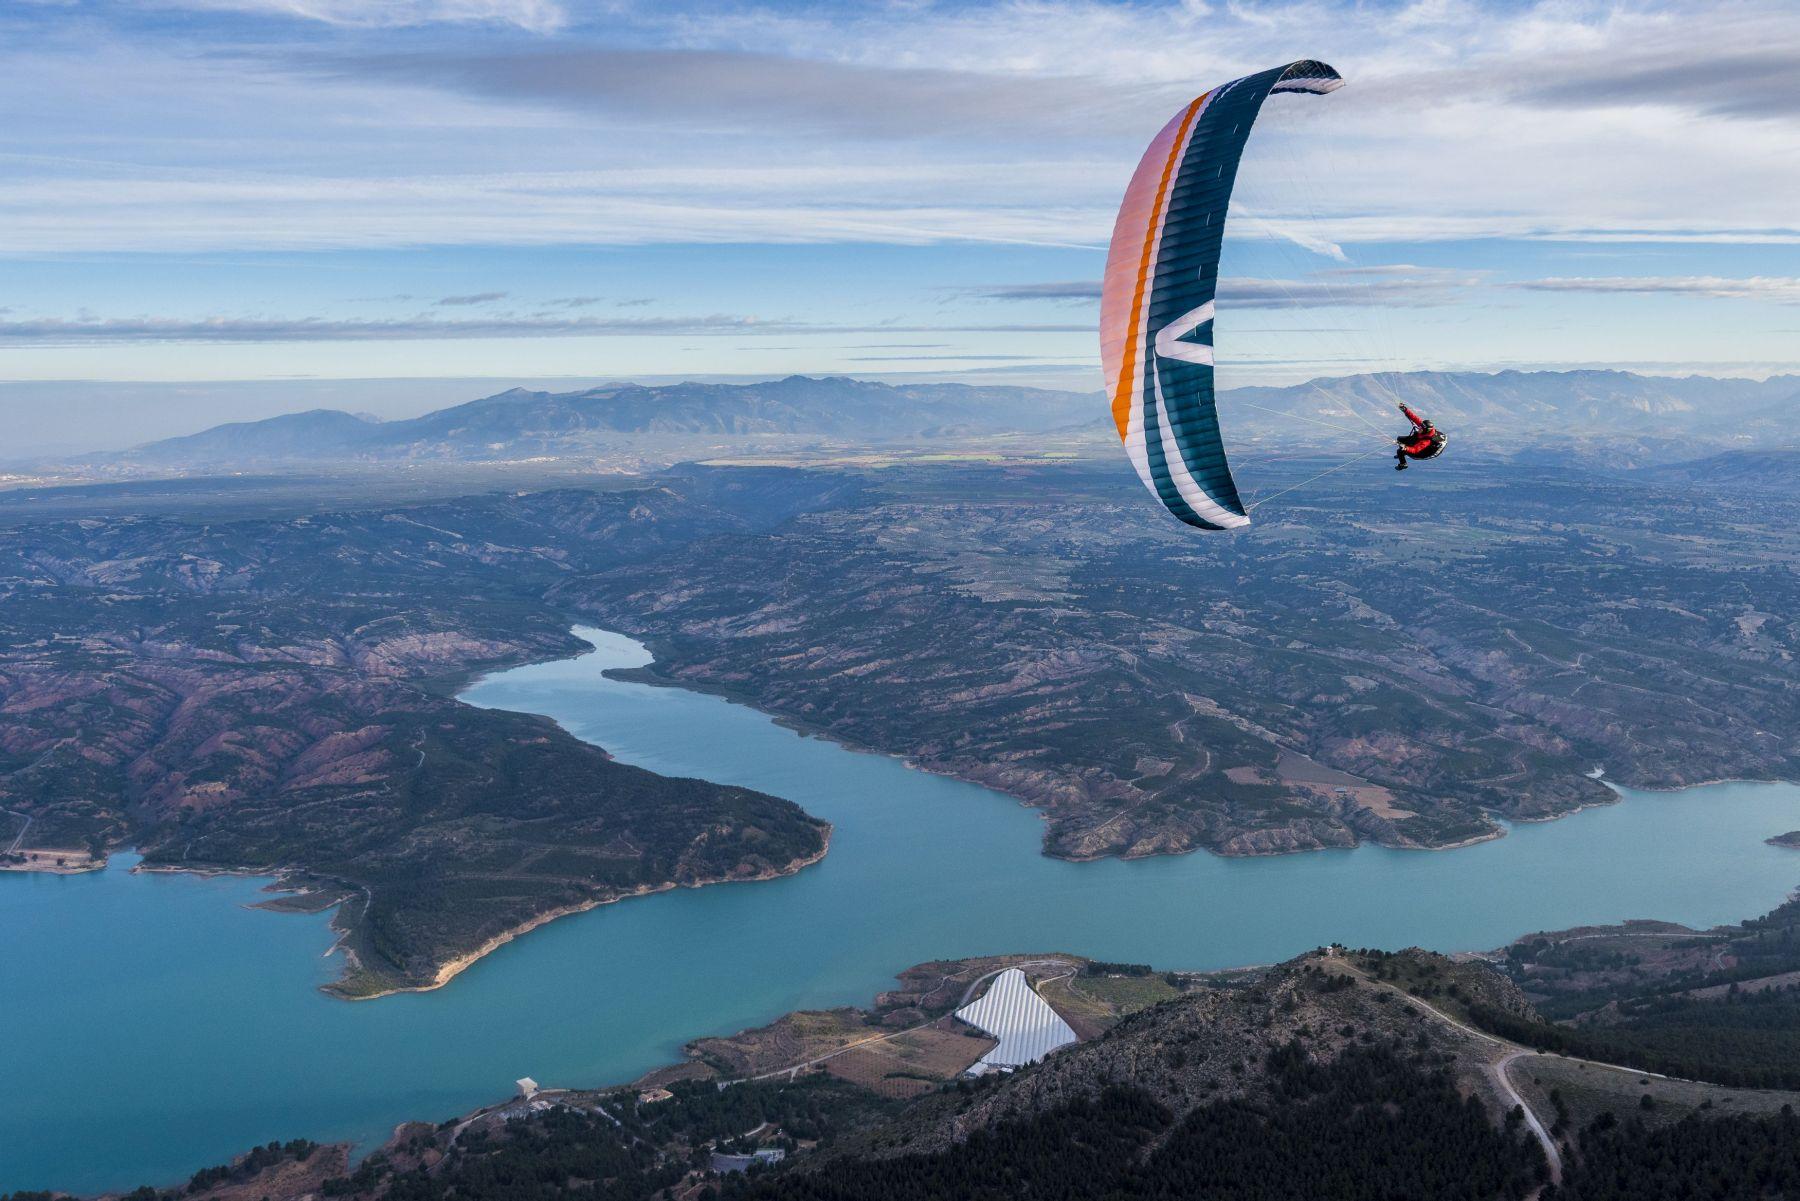 SkyWalk Chili 4